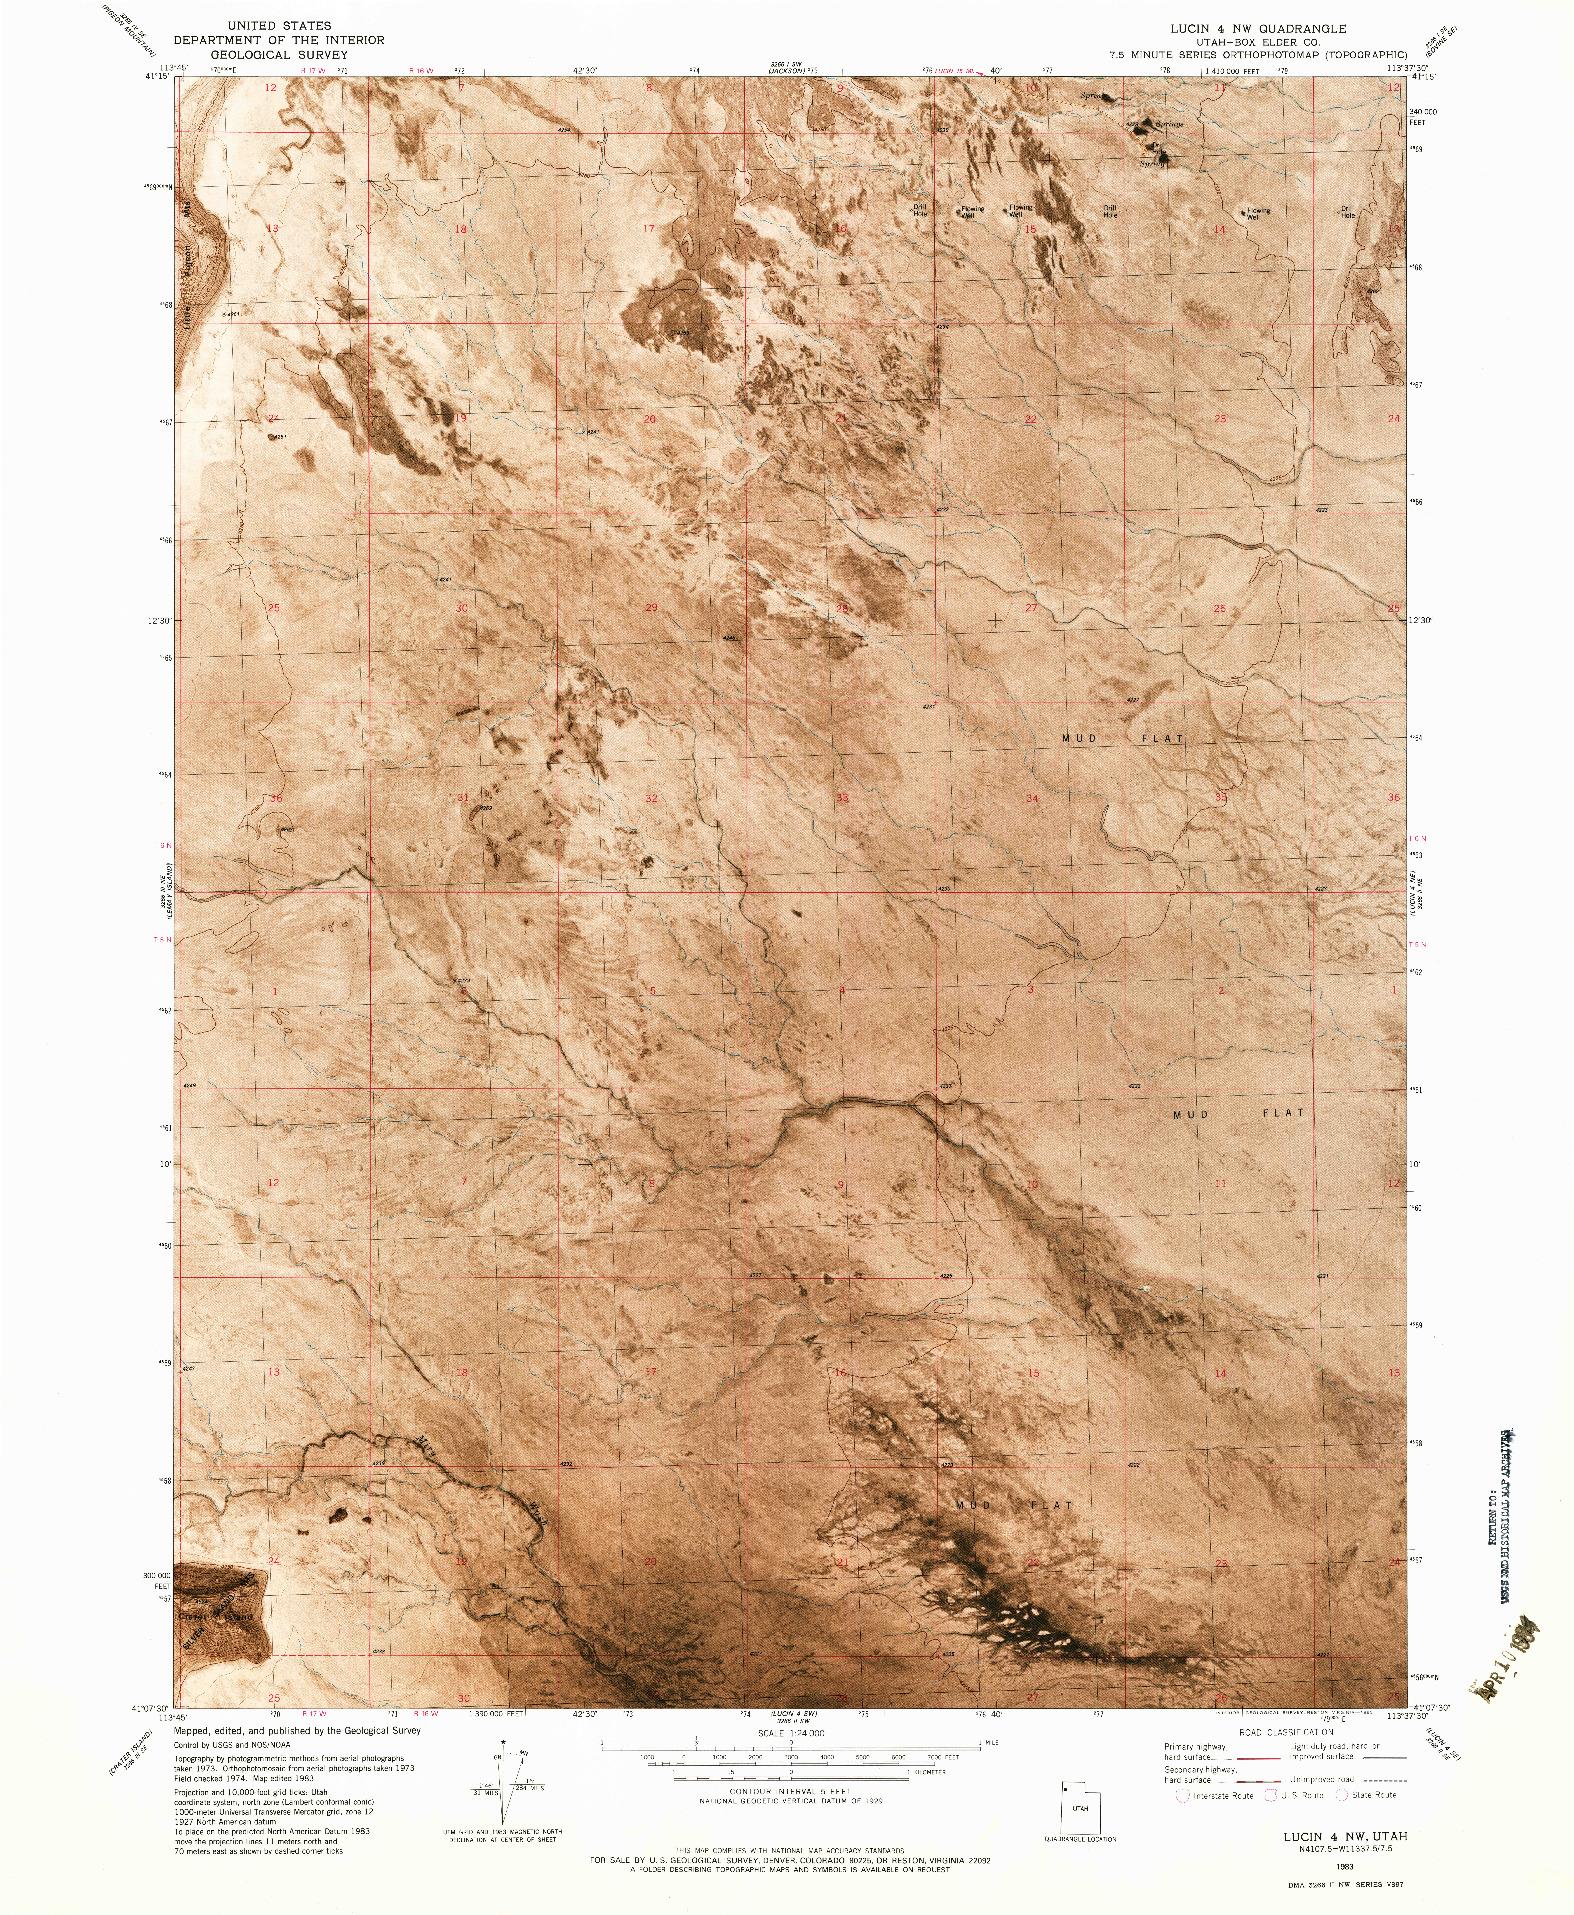 USGS 1:24000-SCALE QUADRANGLE FOR LUCIN 4 NW, UT 1983